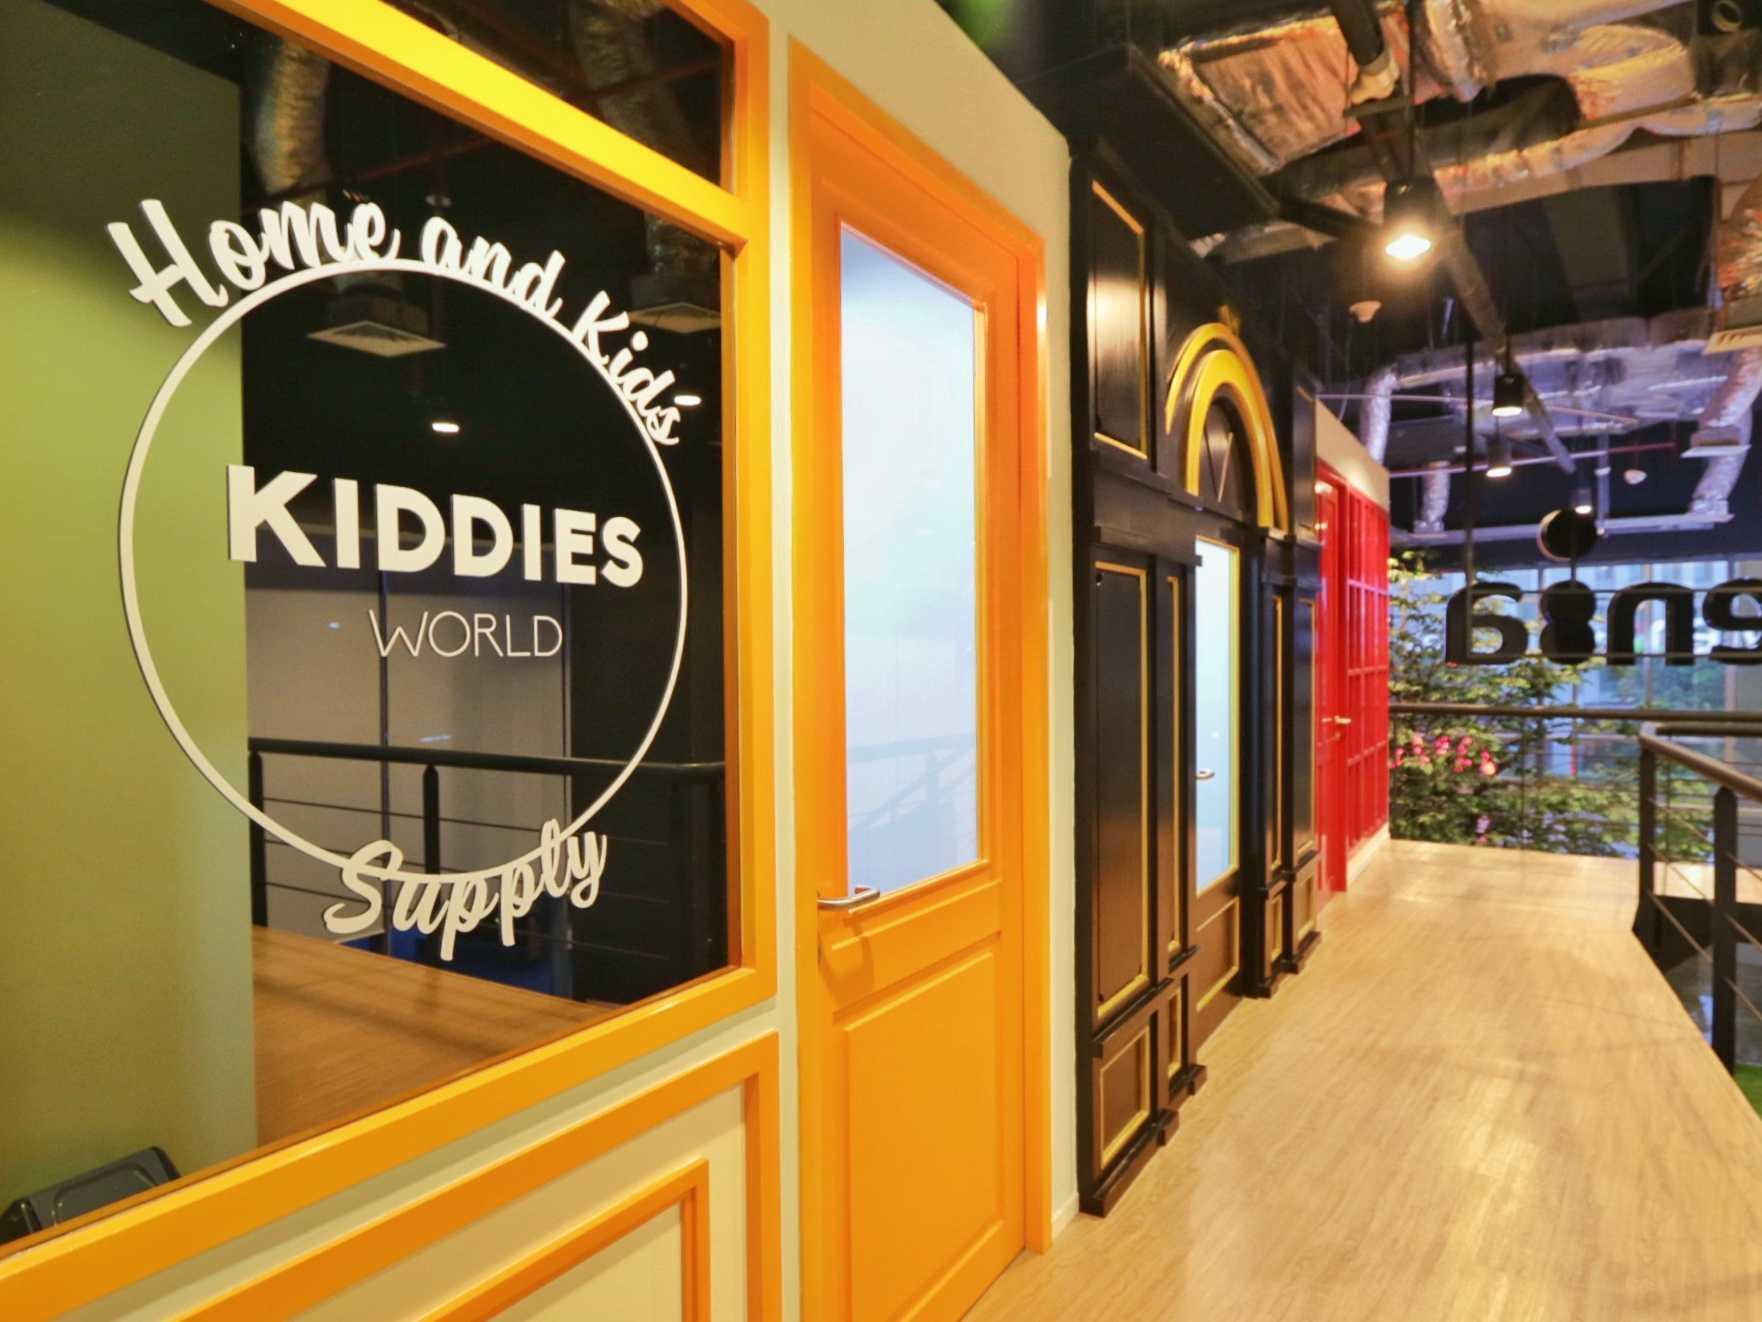 Kotak Design Elevenia Office Daerah Khusus Ibukota Jakarta, Indonesia Daerah Khusus Ibukota Jakarta, Indonesia Kotak-Design-Elevenia-Office  56775